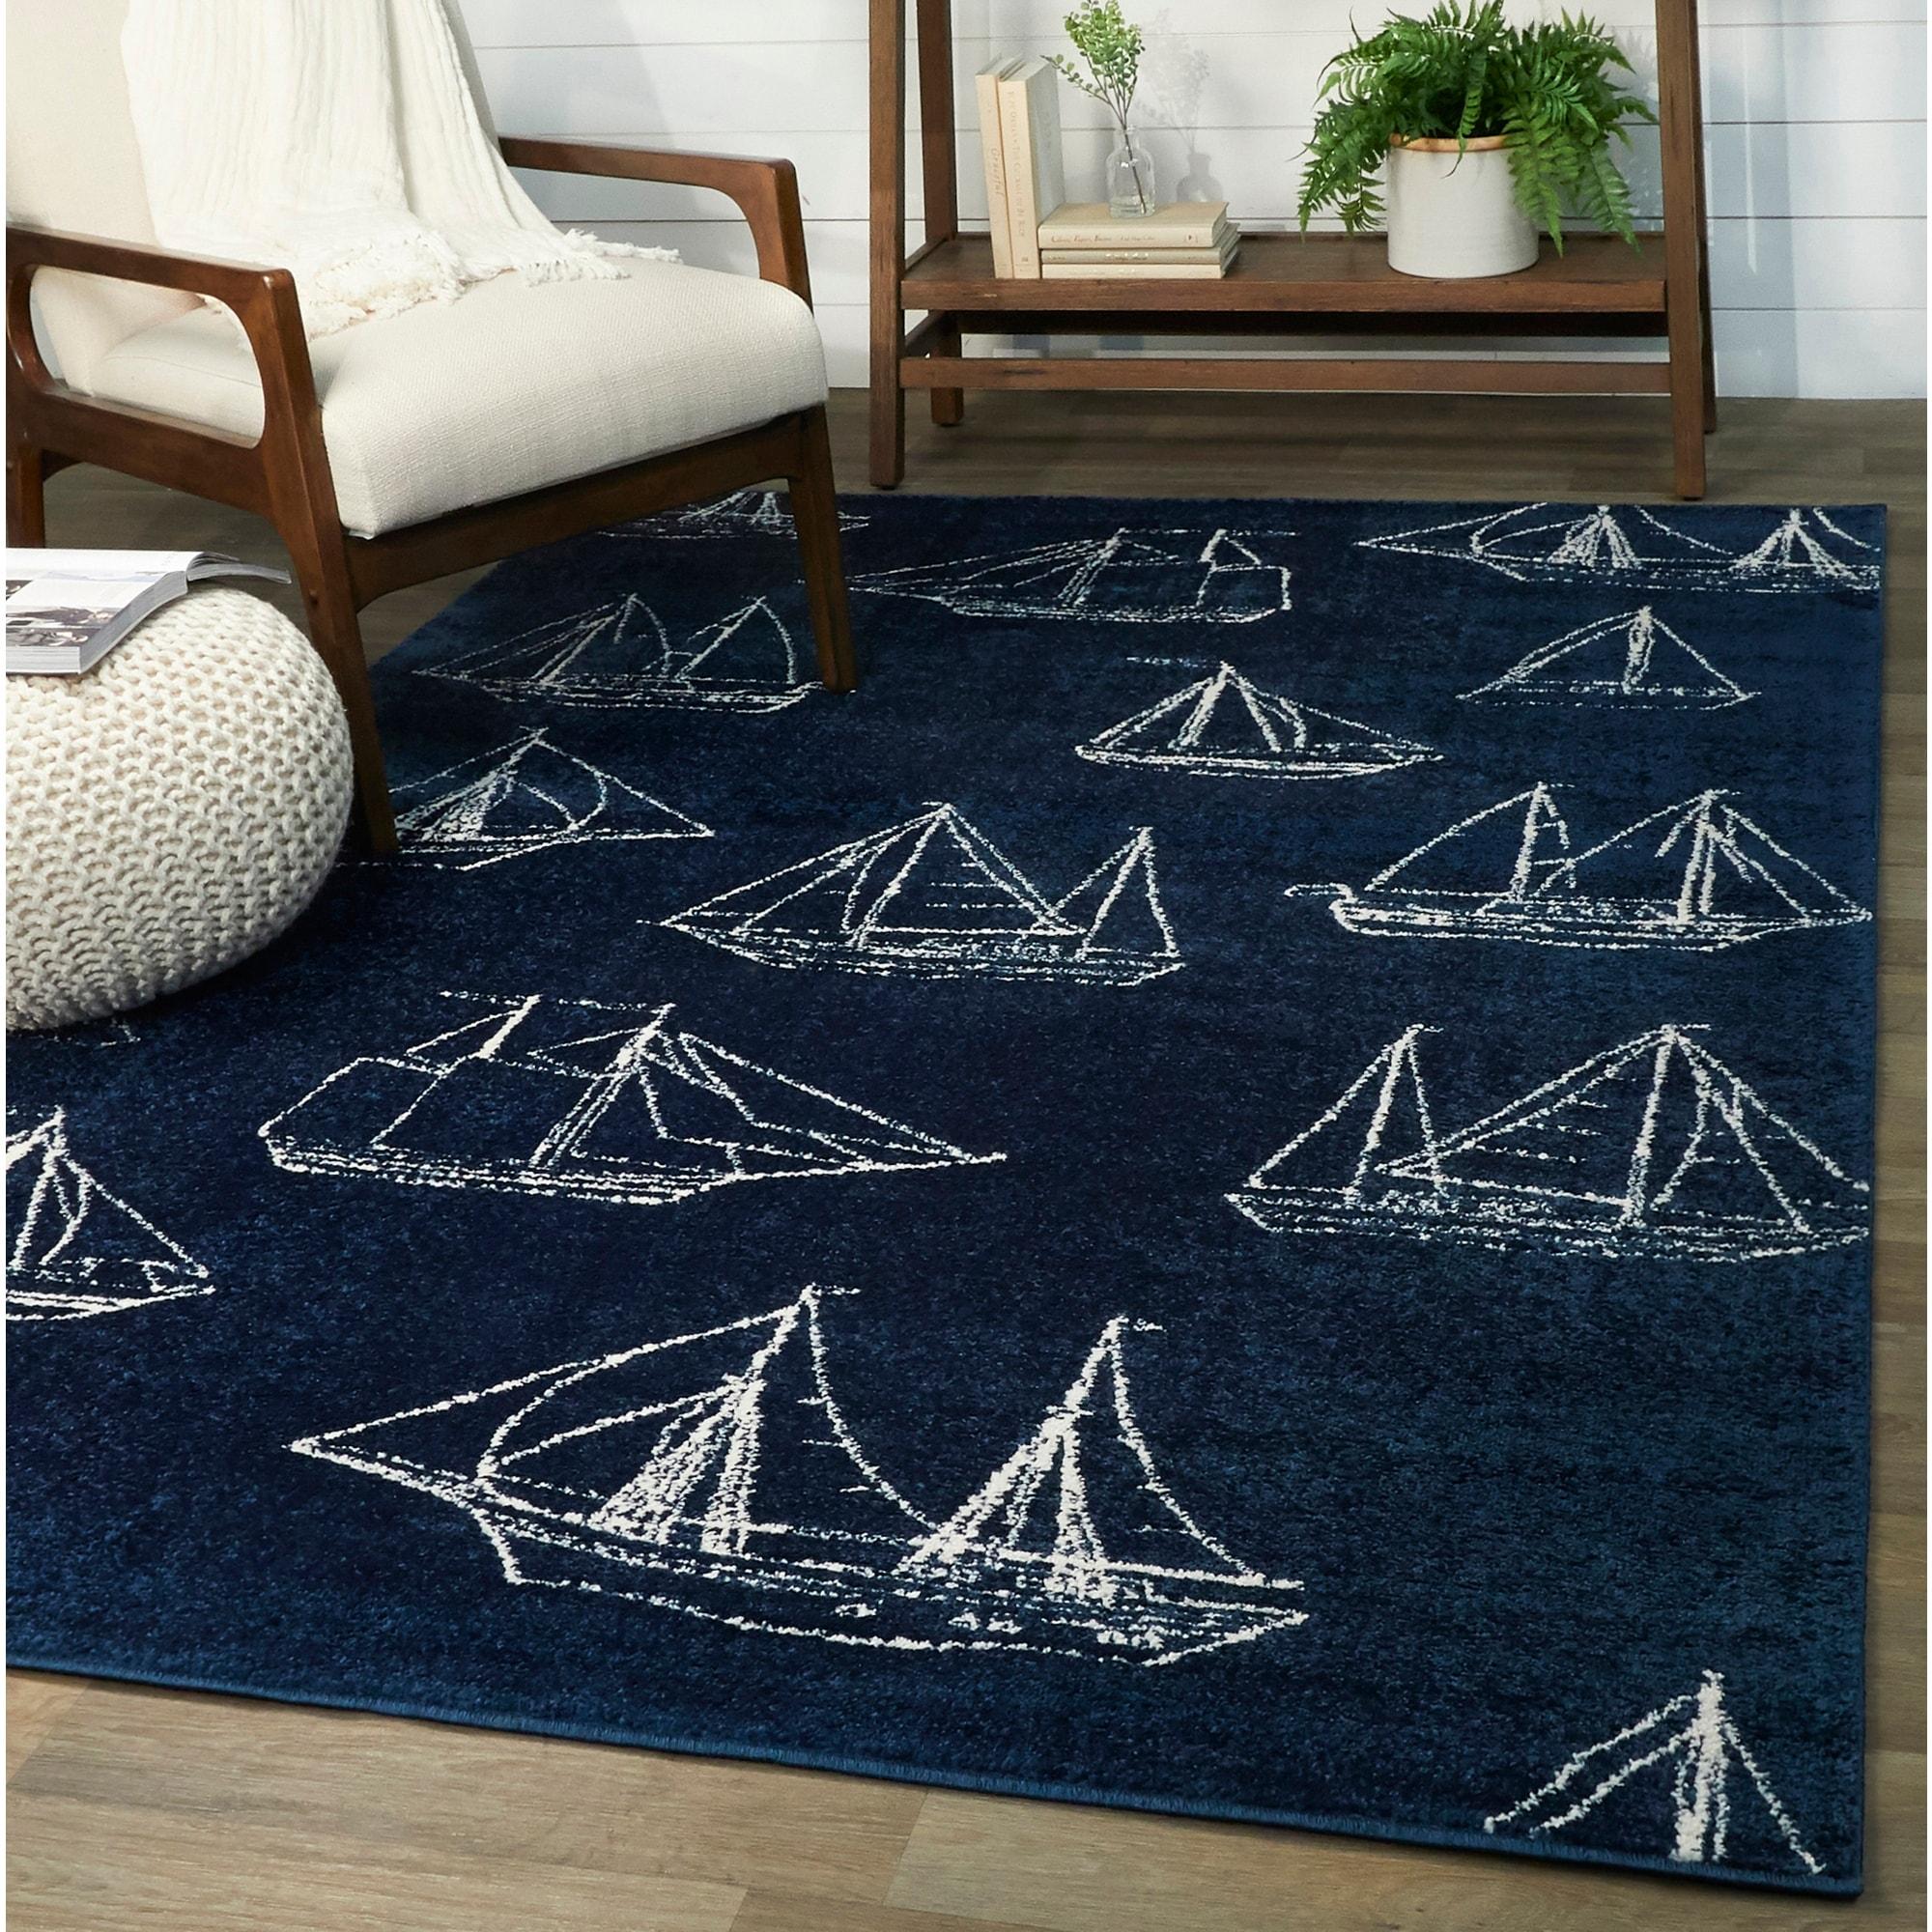 Marino Ship Sailboat Coastal Area Rug On Sale Overstock 30036614